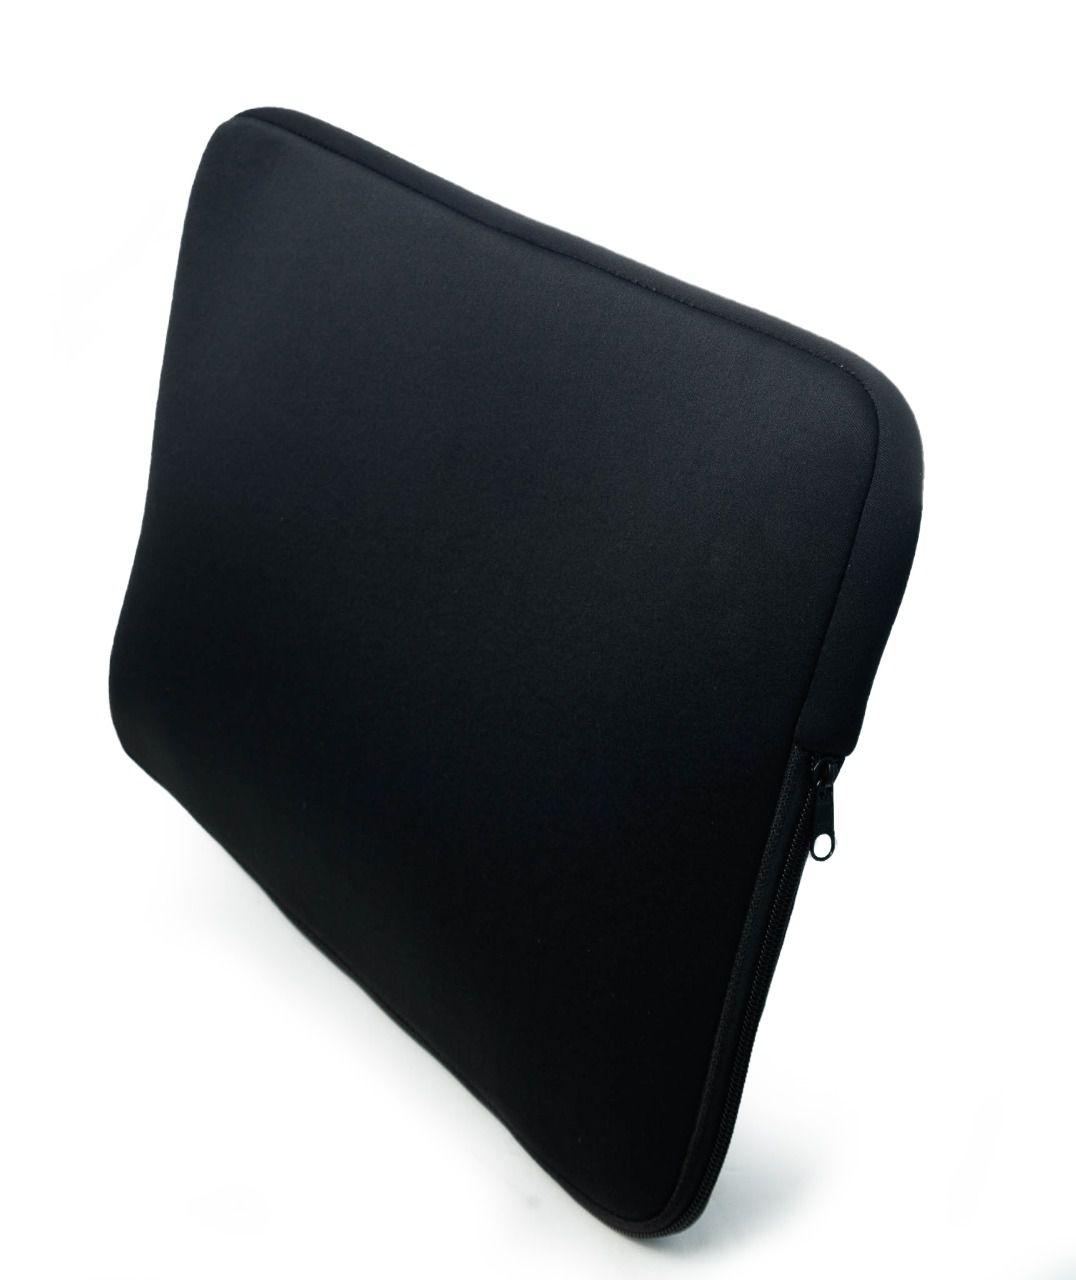 Luva Capa Case 15,6 Polegadas Preta para Notebook Ultrabook